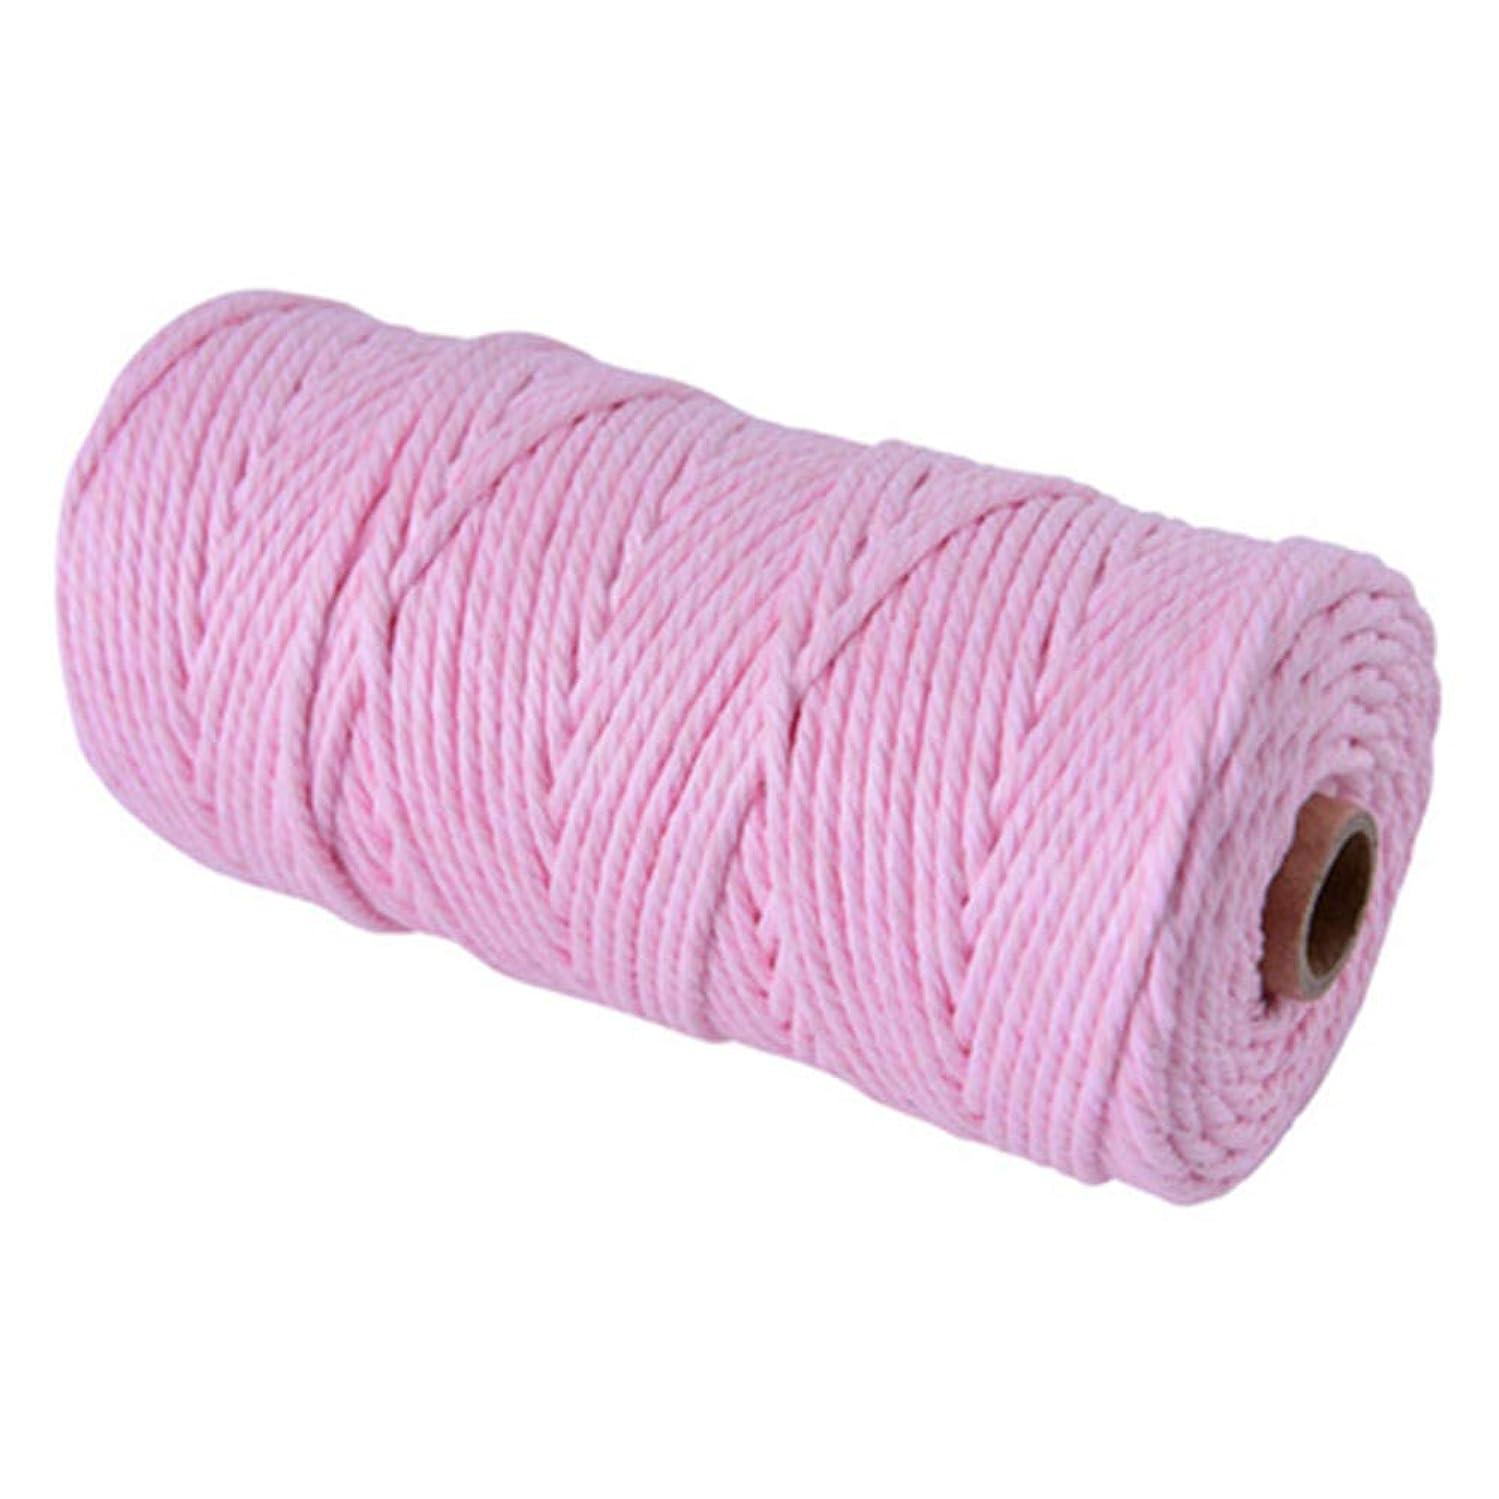 Natural Macrame Cord,Light Pink 3mm Cotton Macrame Wall Hanging Plant Hanger Craft Making Knitting Cord Rope (Light Pink, 3mm)